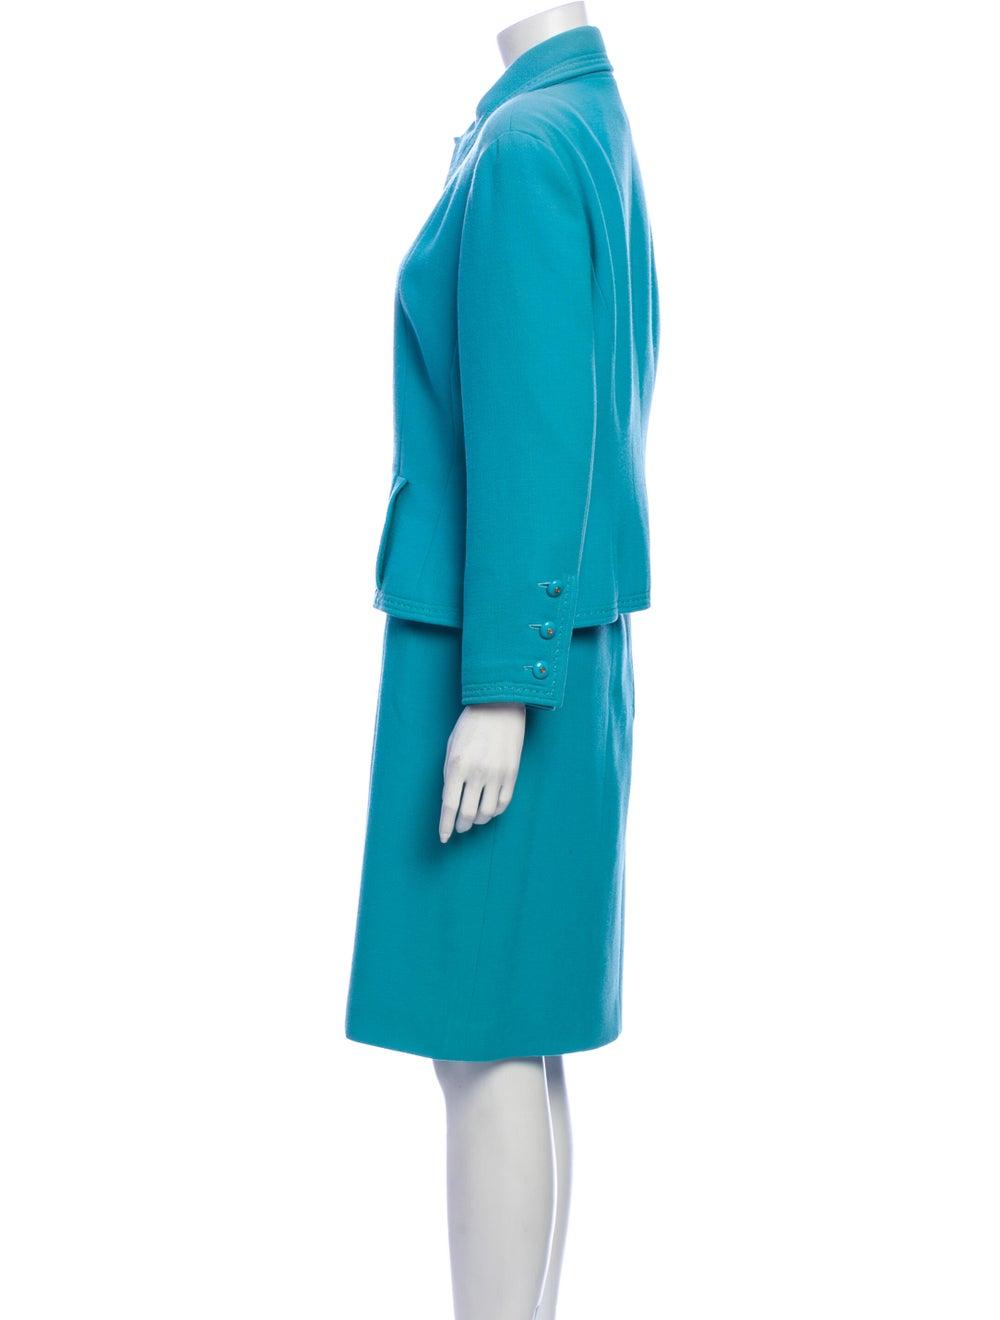 Chanel Vintage 1980's Skirt Suit Blue - image 2